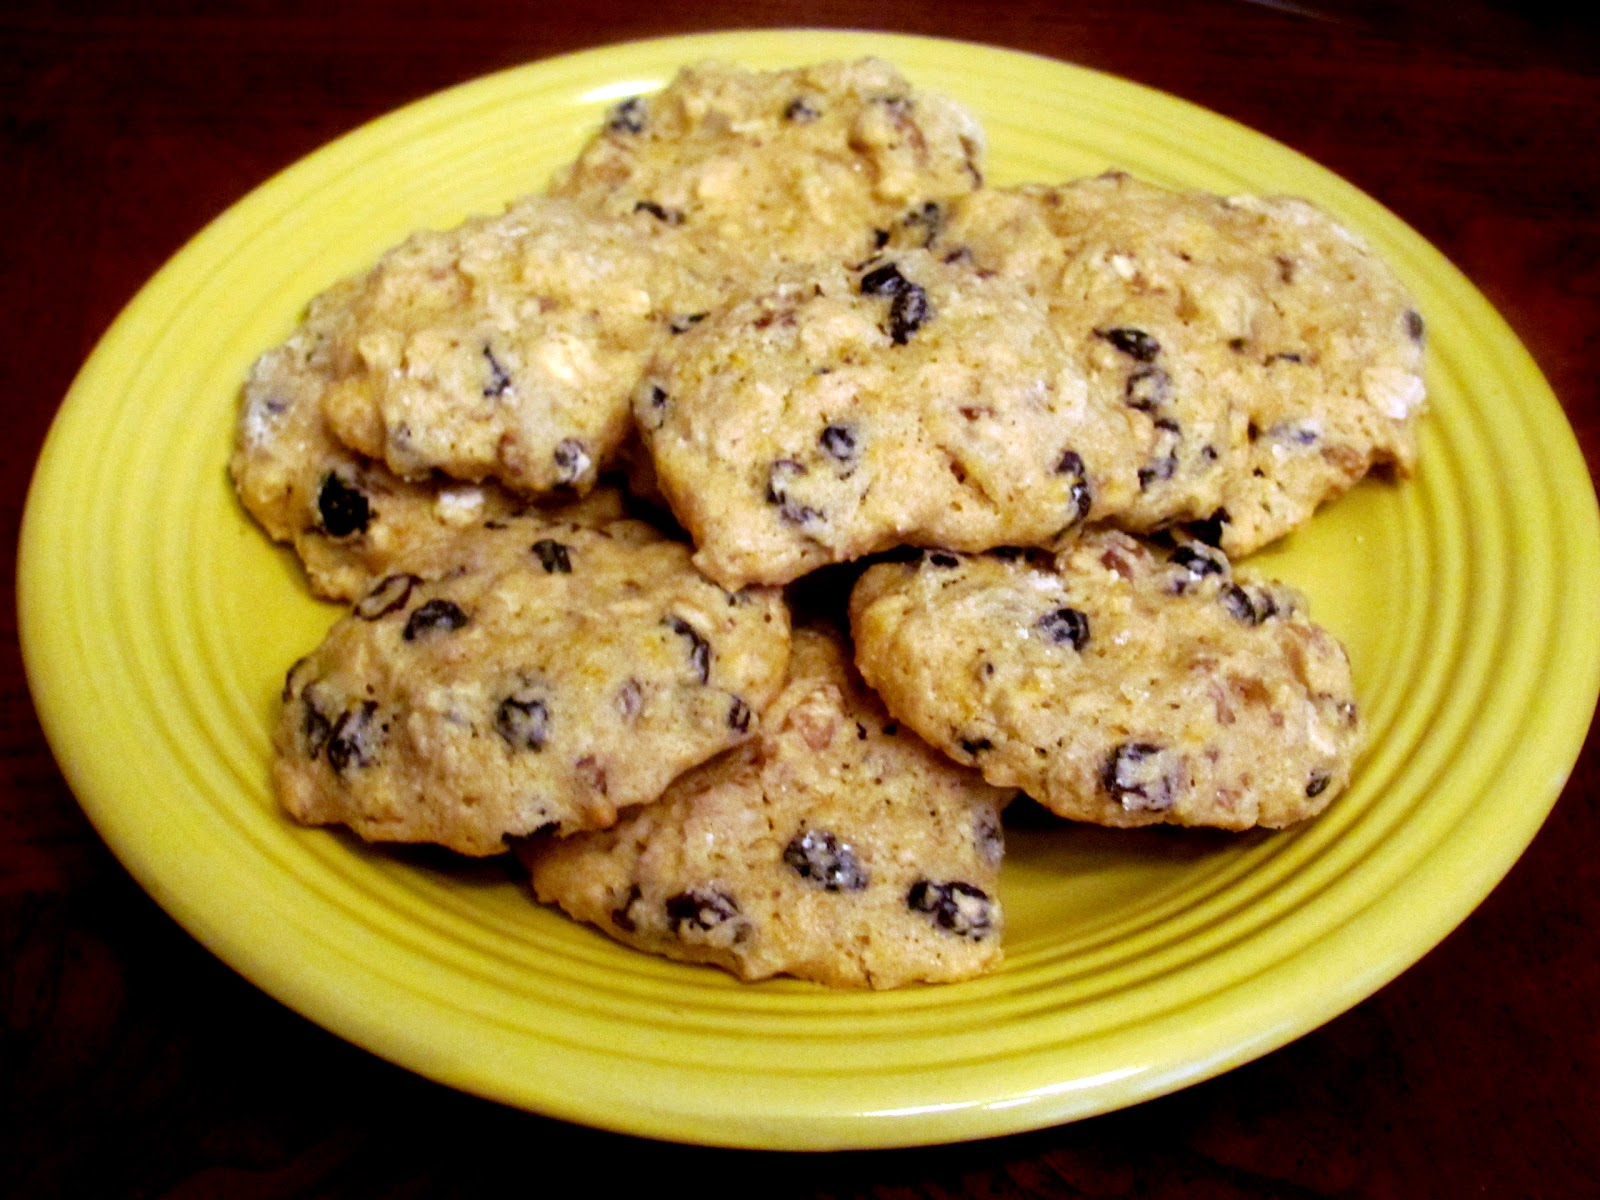 The Health Seekers Kitchen: Orange Ginger Cookies